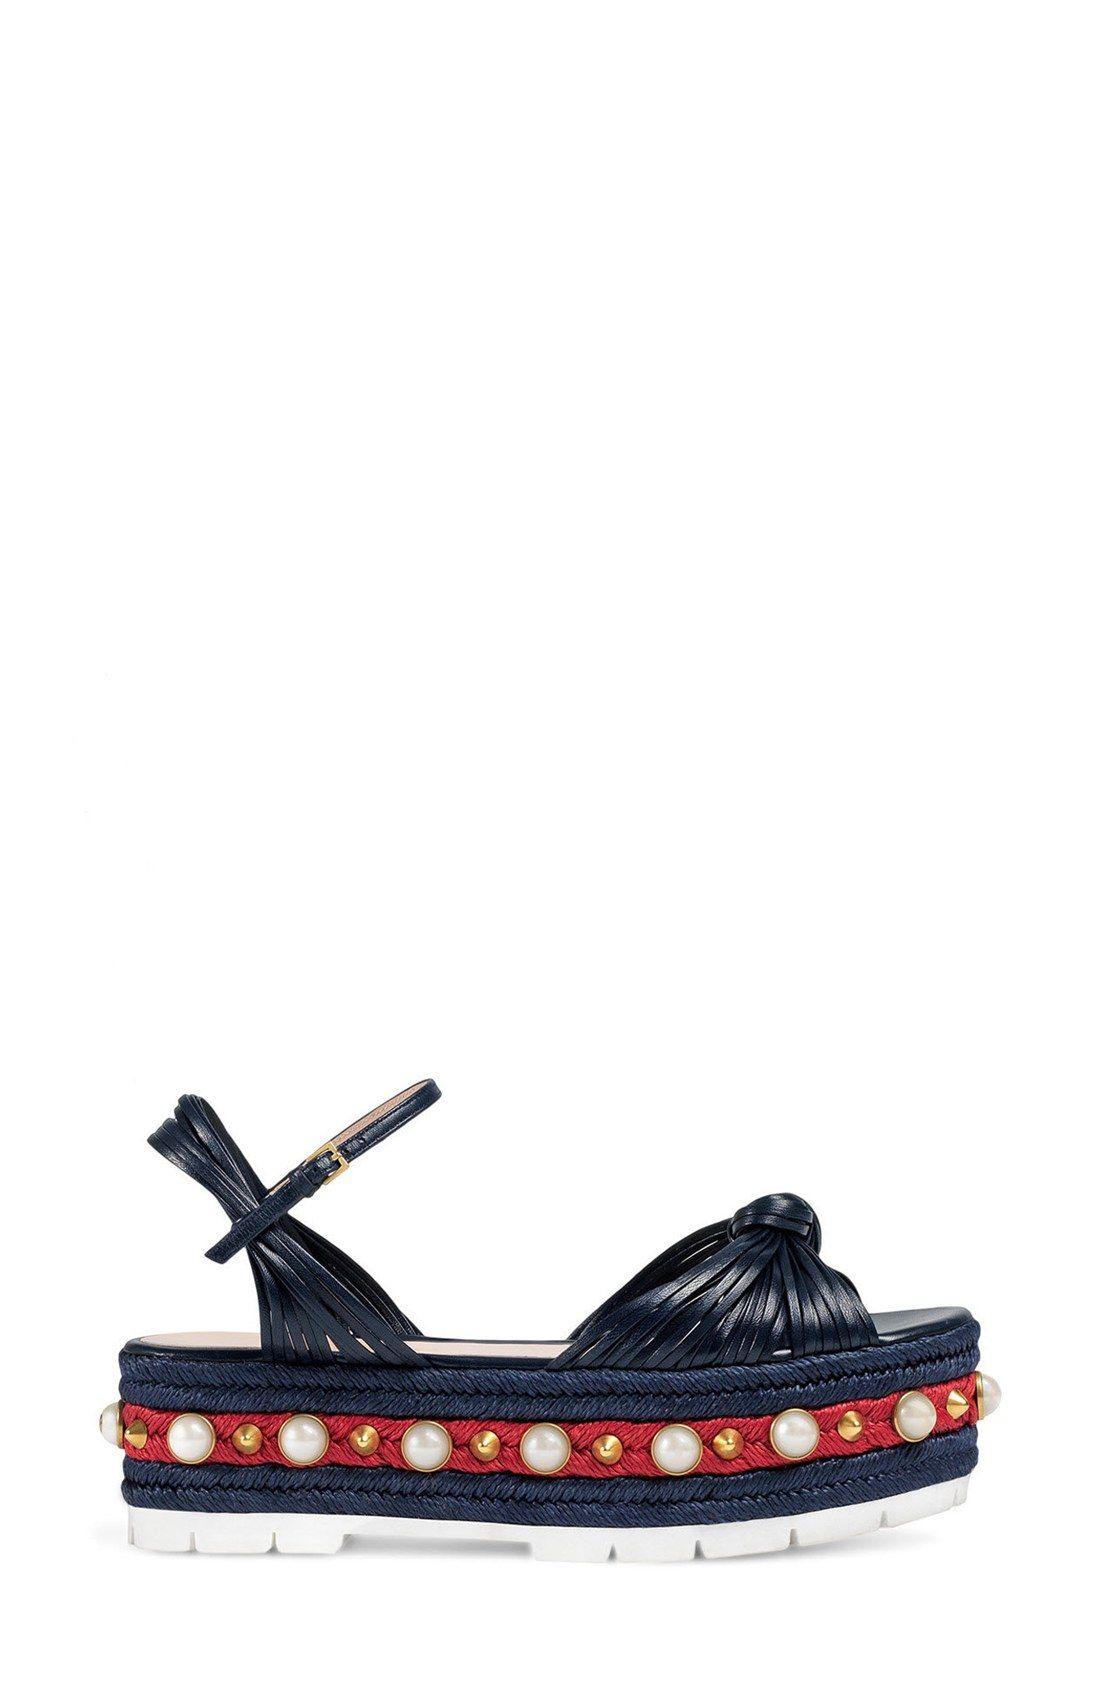 6b109c1243f4 Gucci Barbette Platform Sandal